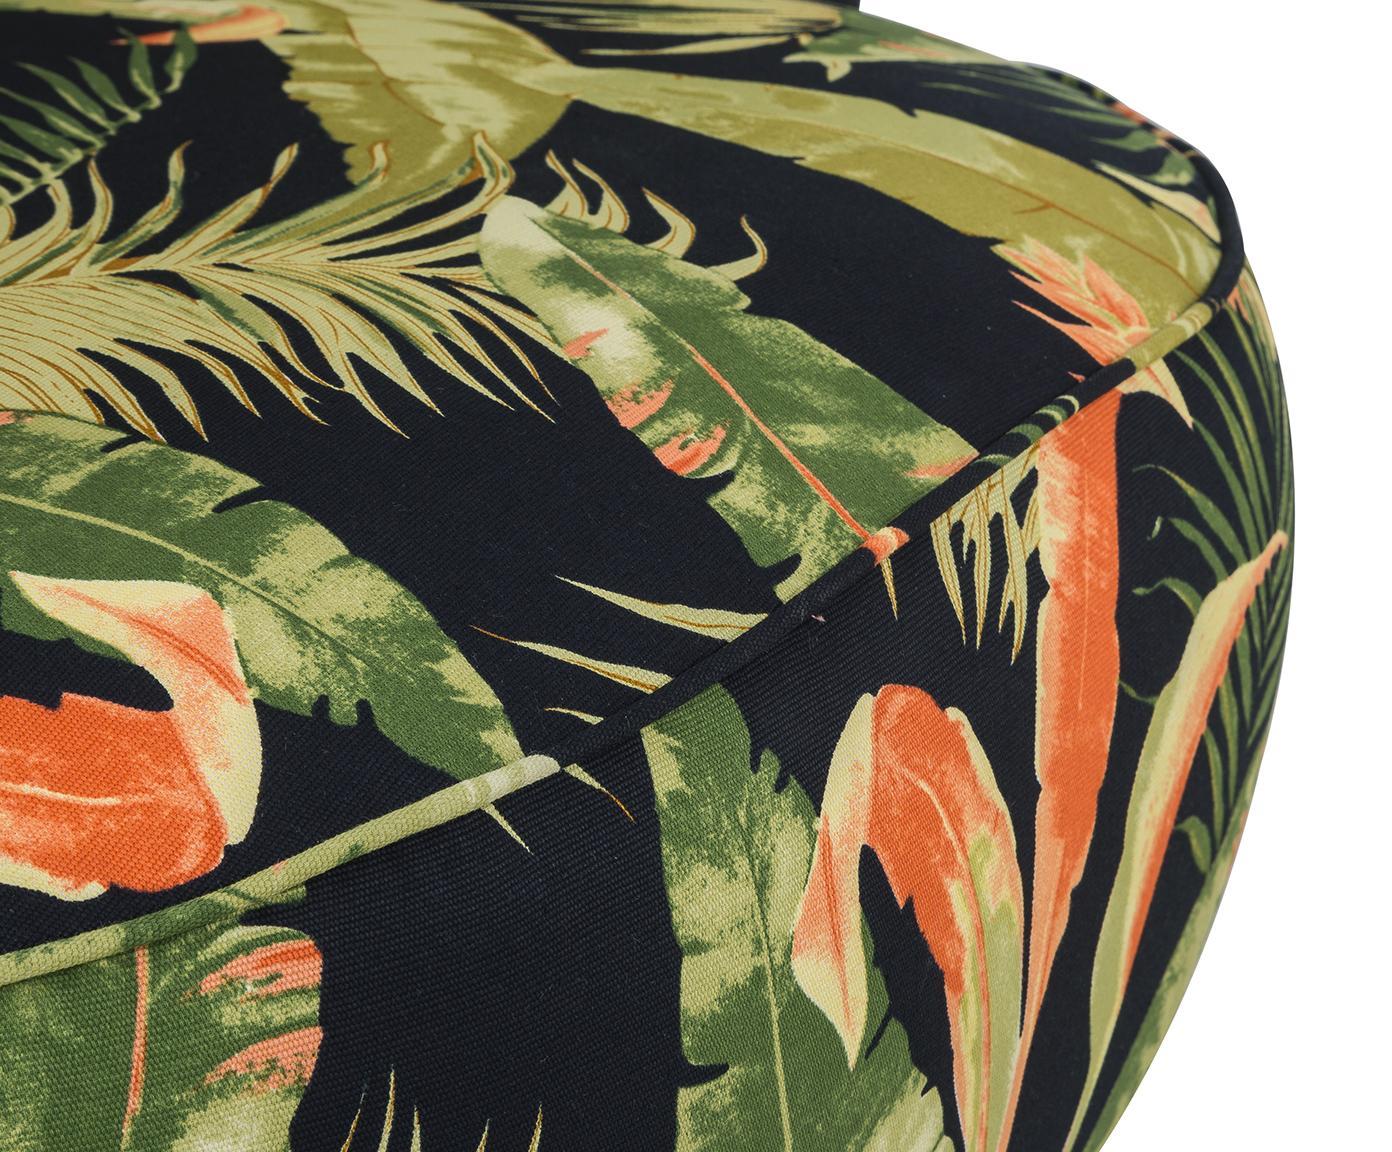 Fauteuil Ella, Bekleding: polyester, Poten: gelakt metaal, Multicolour, B 74 x D 78 cm